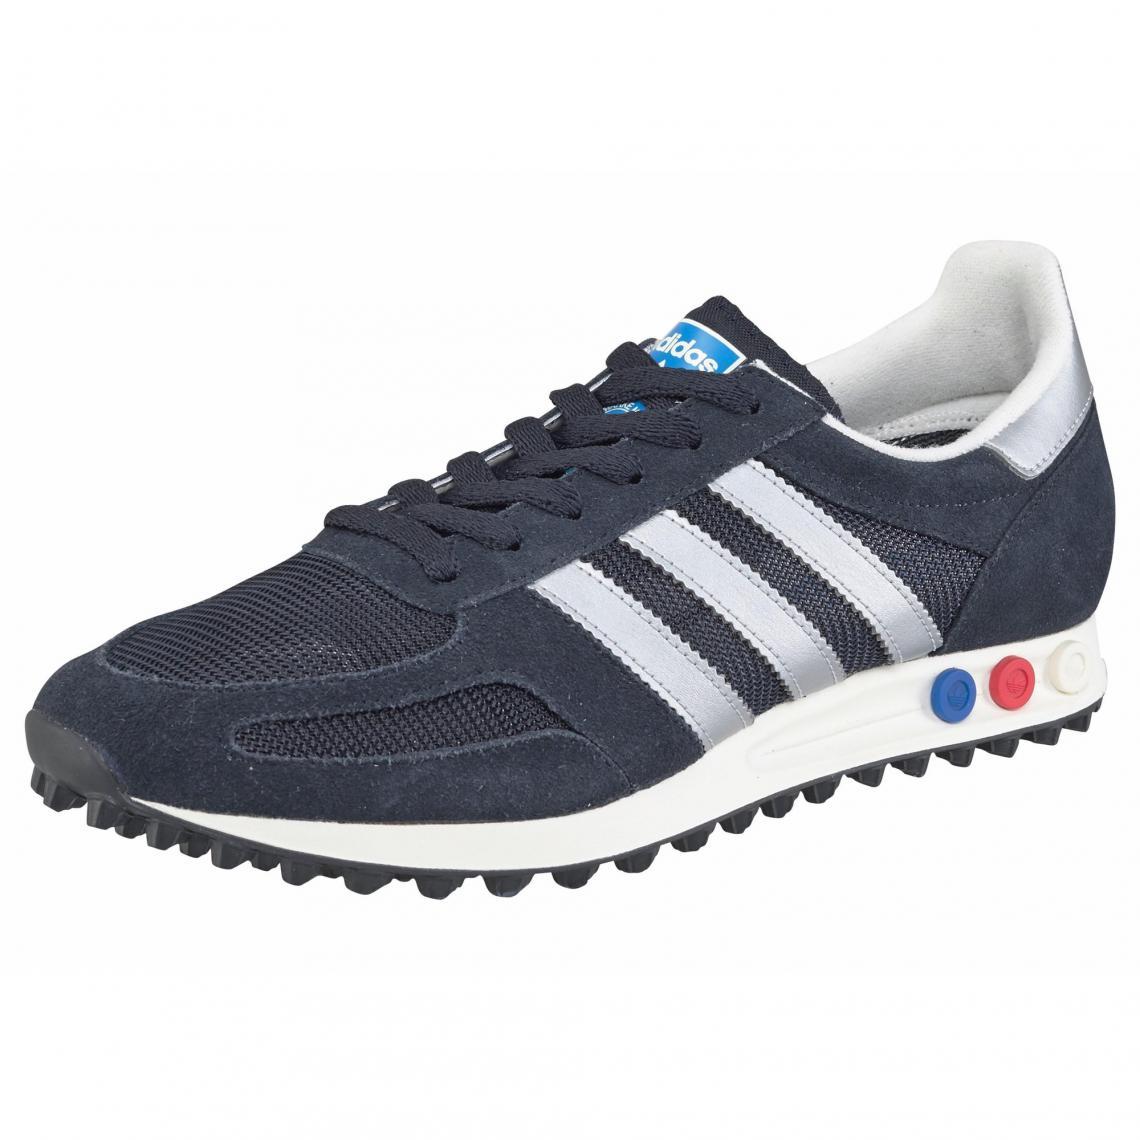 best cheap 69335 1be9b Toutes les chaussures Adidas Originals